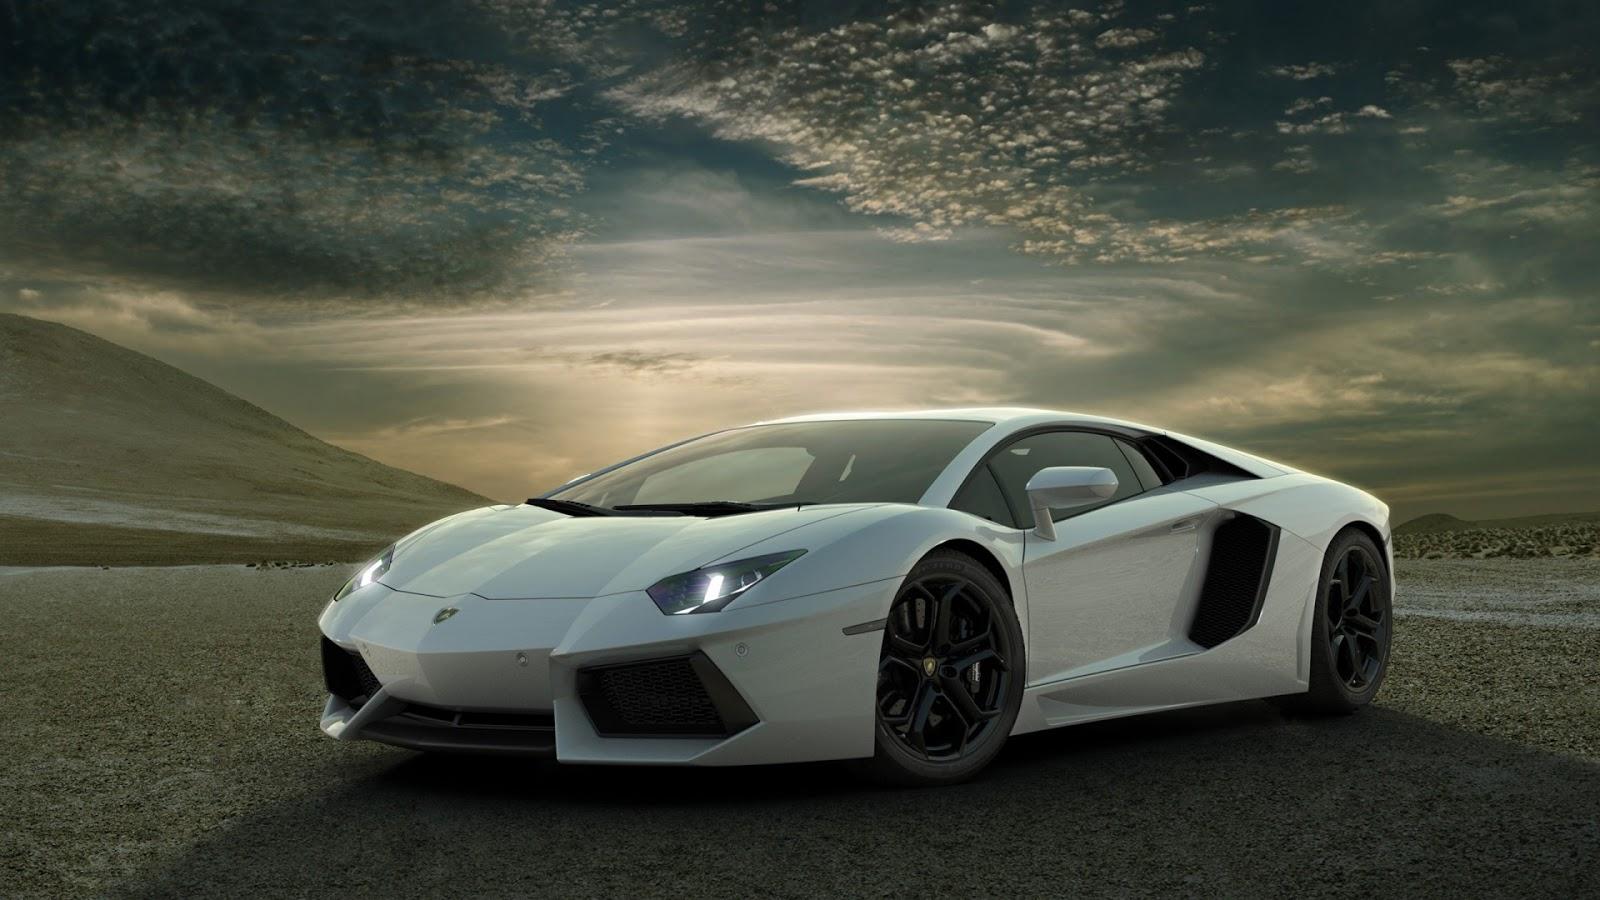 Cool White Lamborghini Wallpaper HD